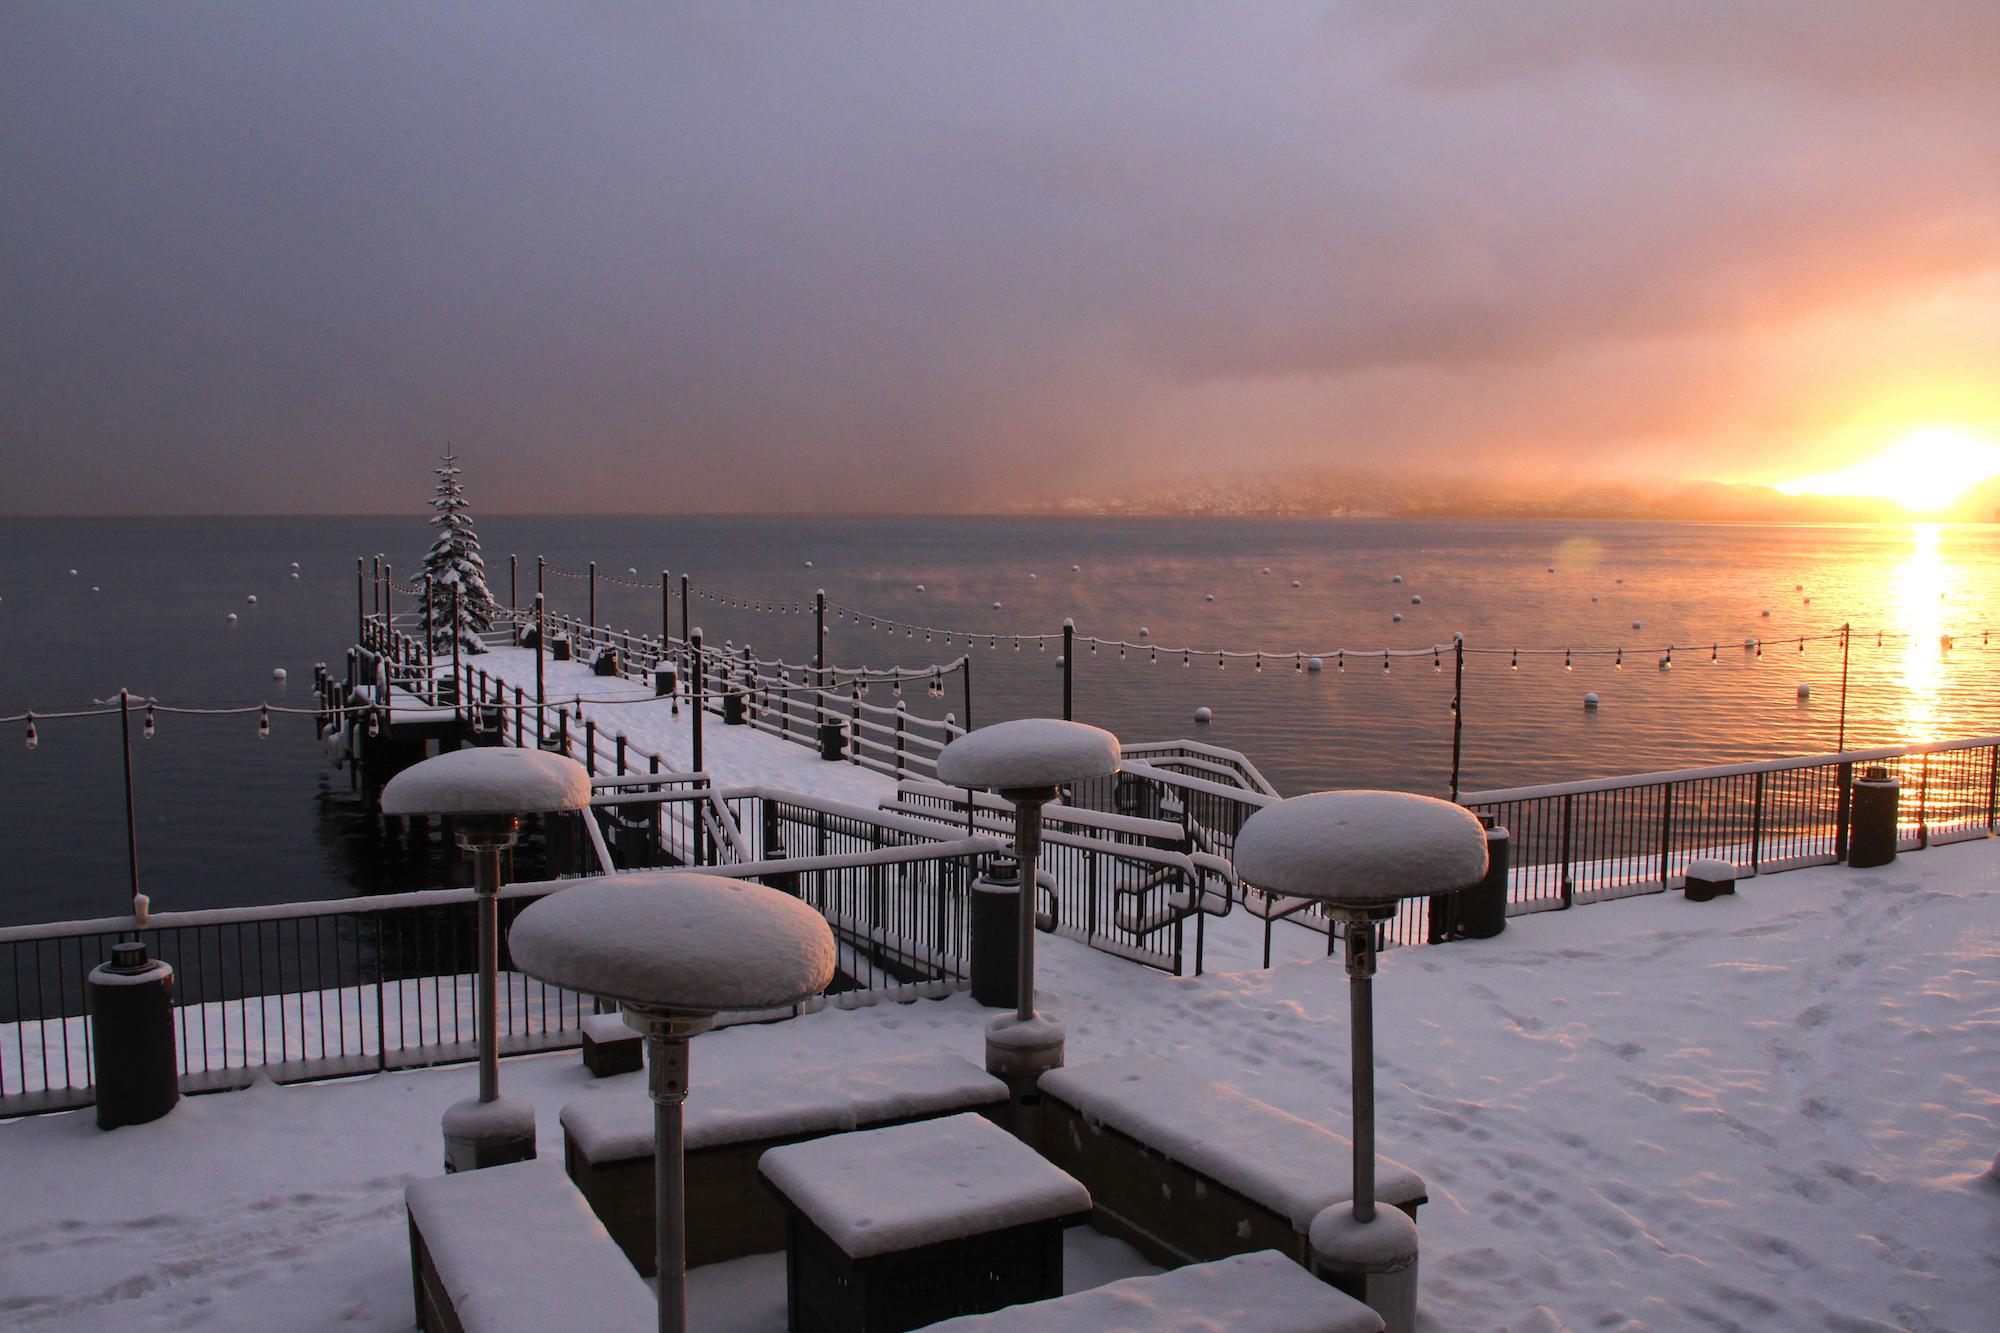 West Shore Cafe Winter